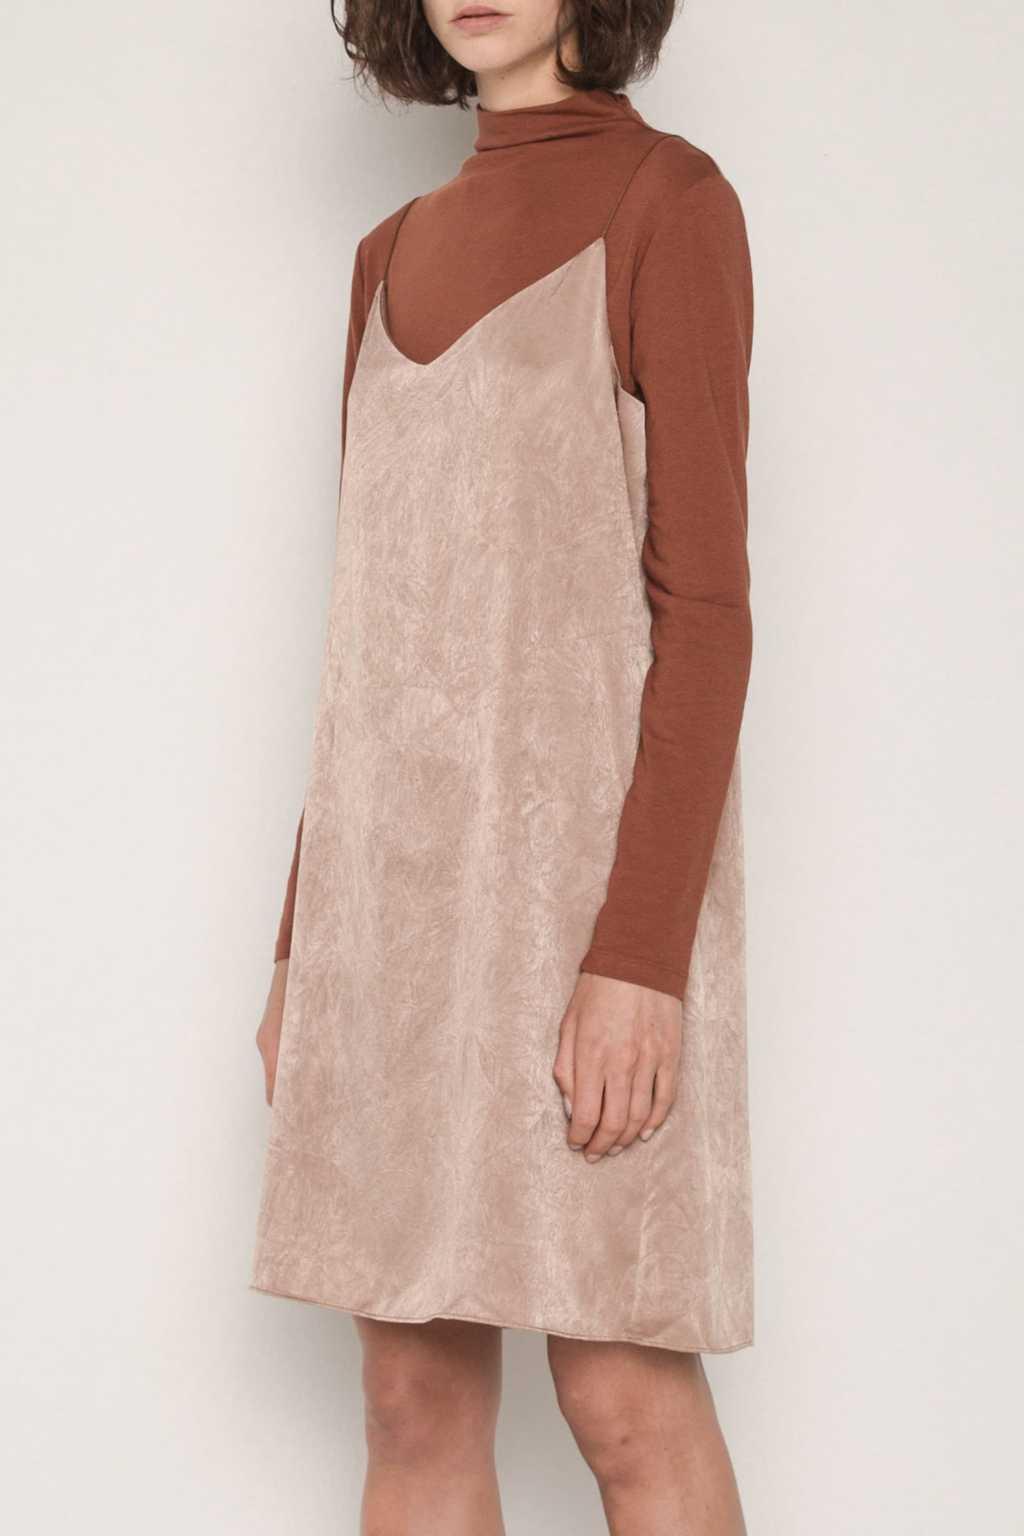 Dress H233 Beige 2